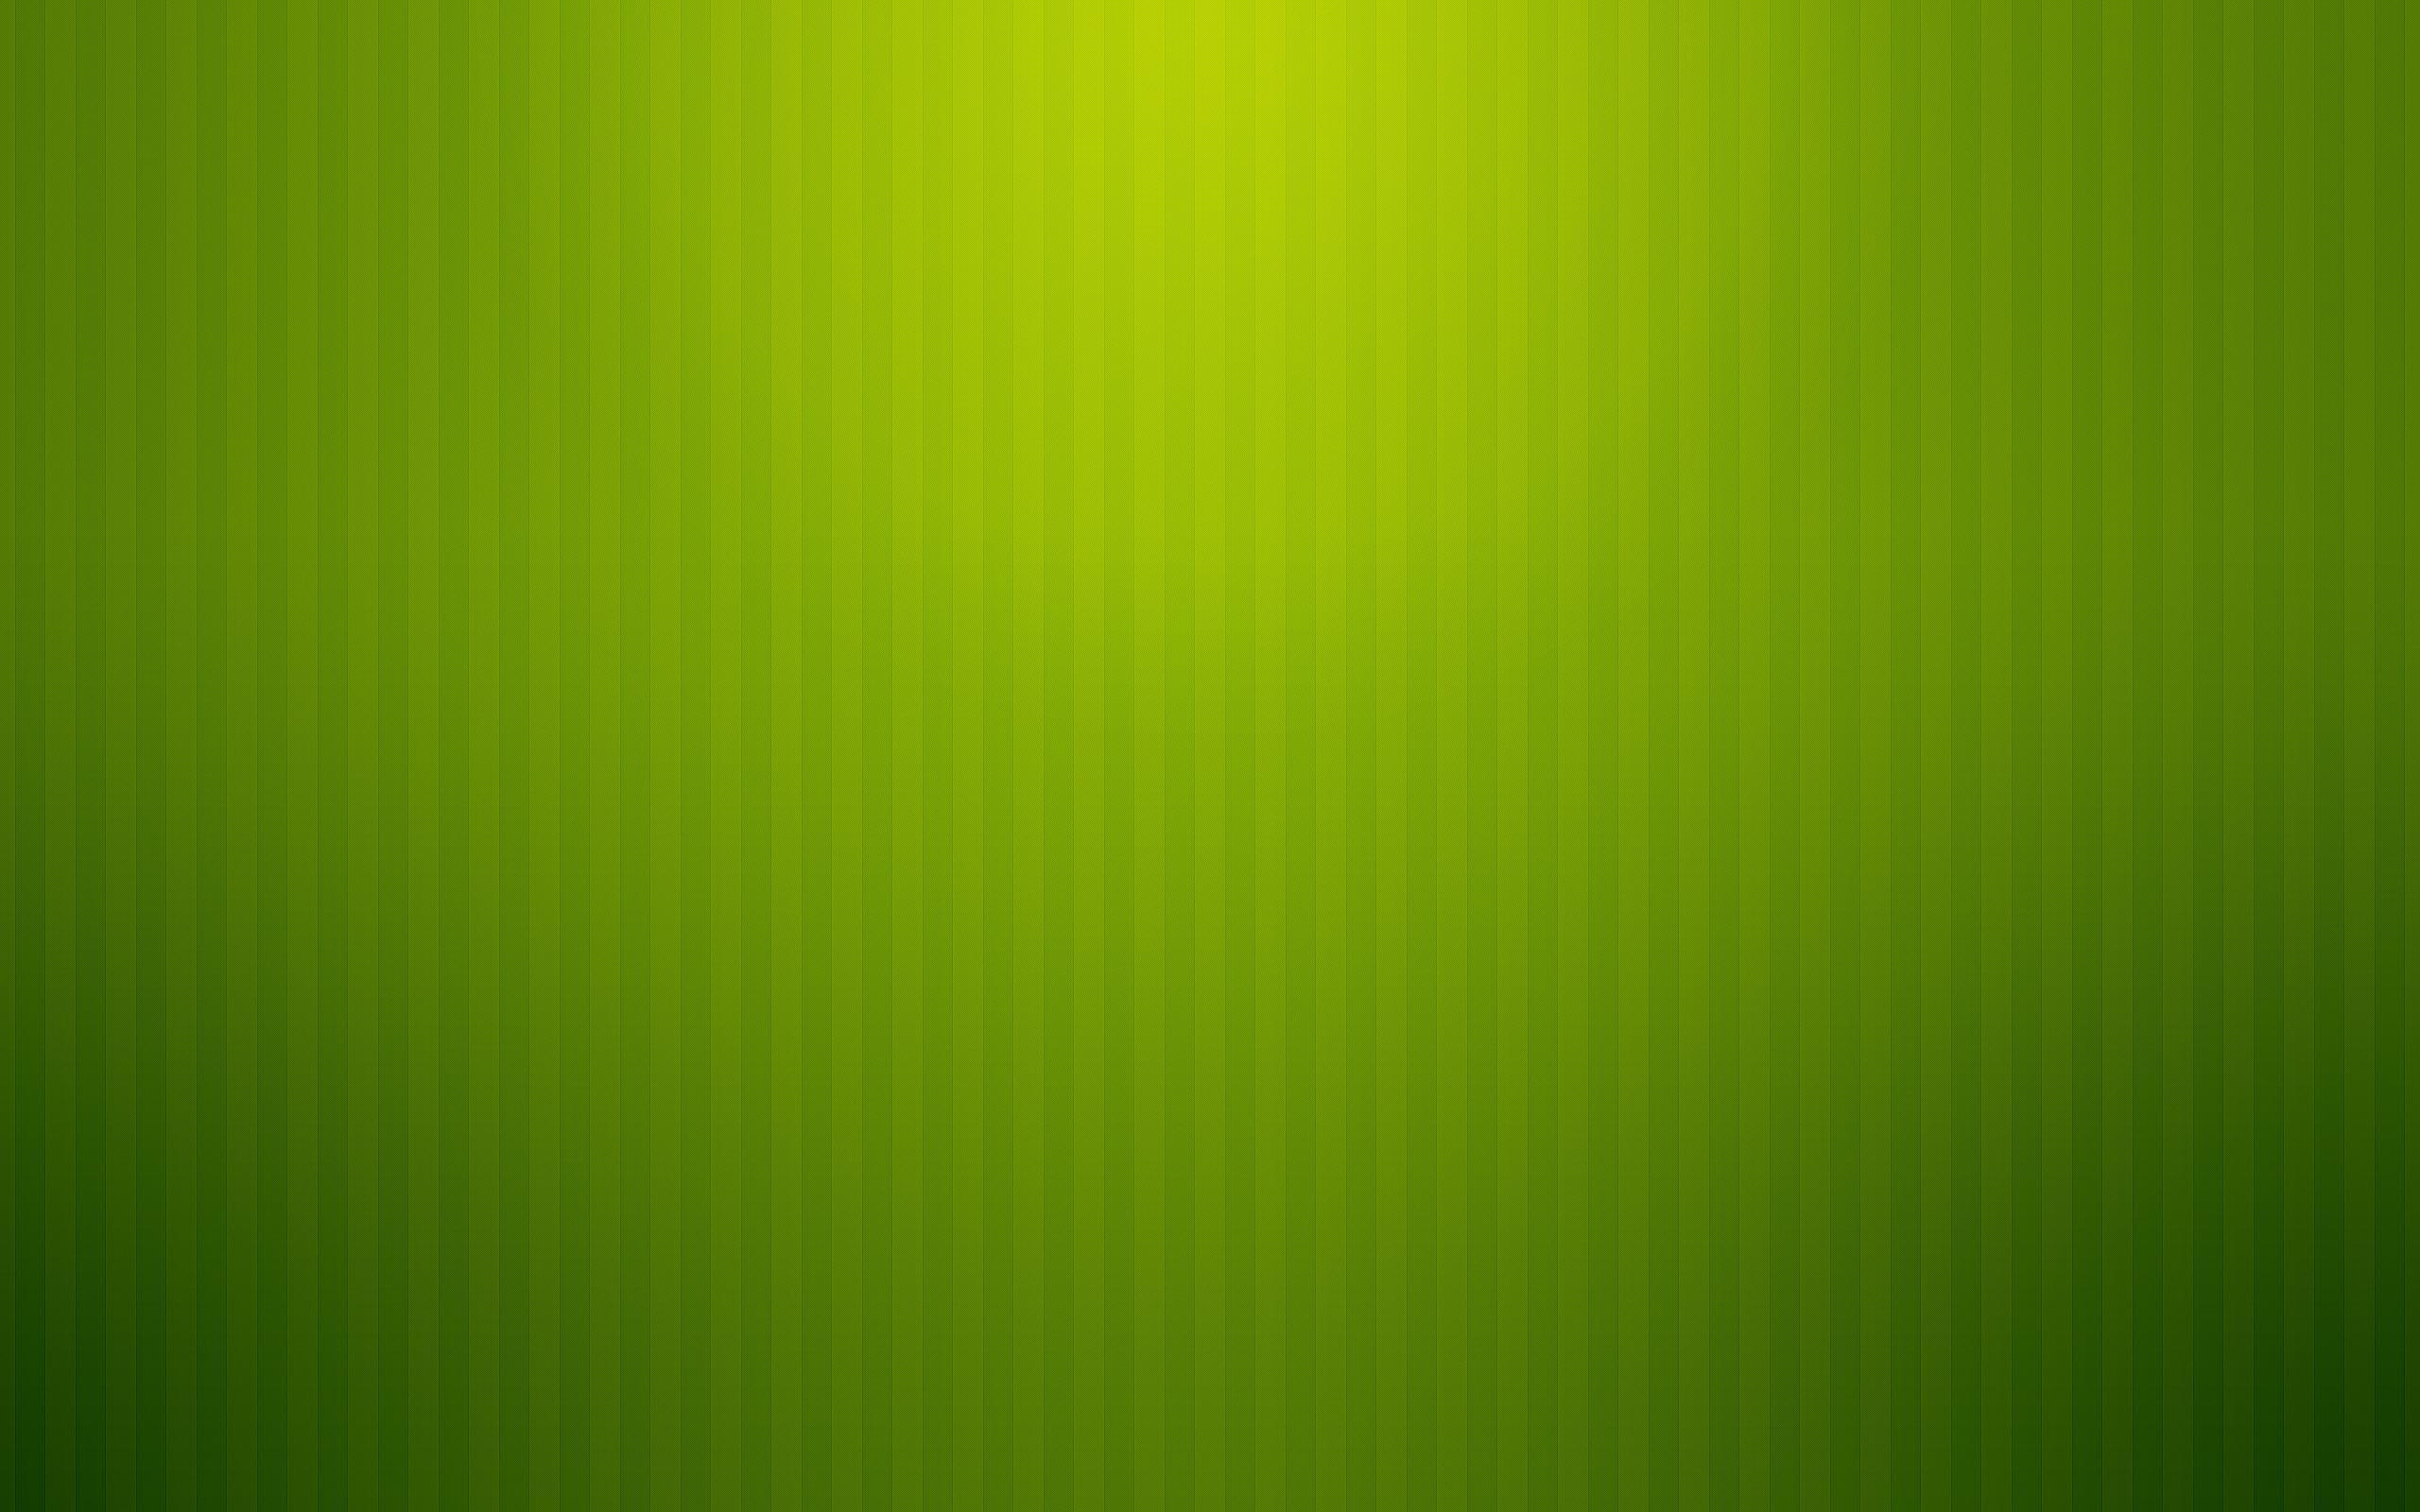 Plain Green Hd Wallpaper